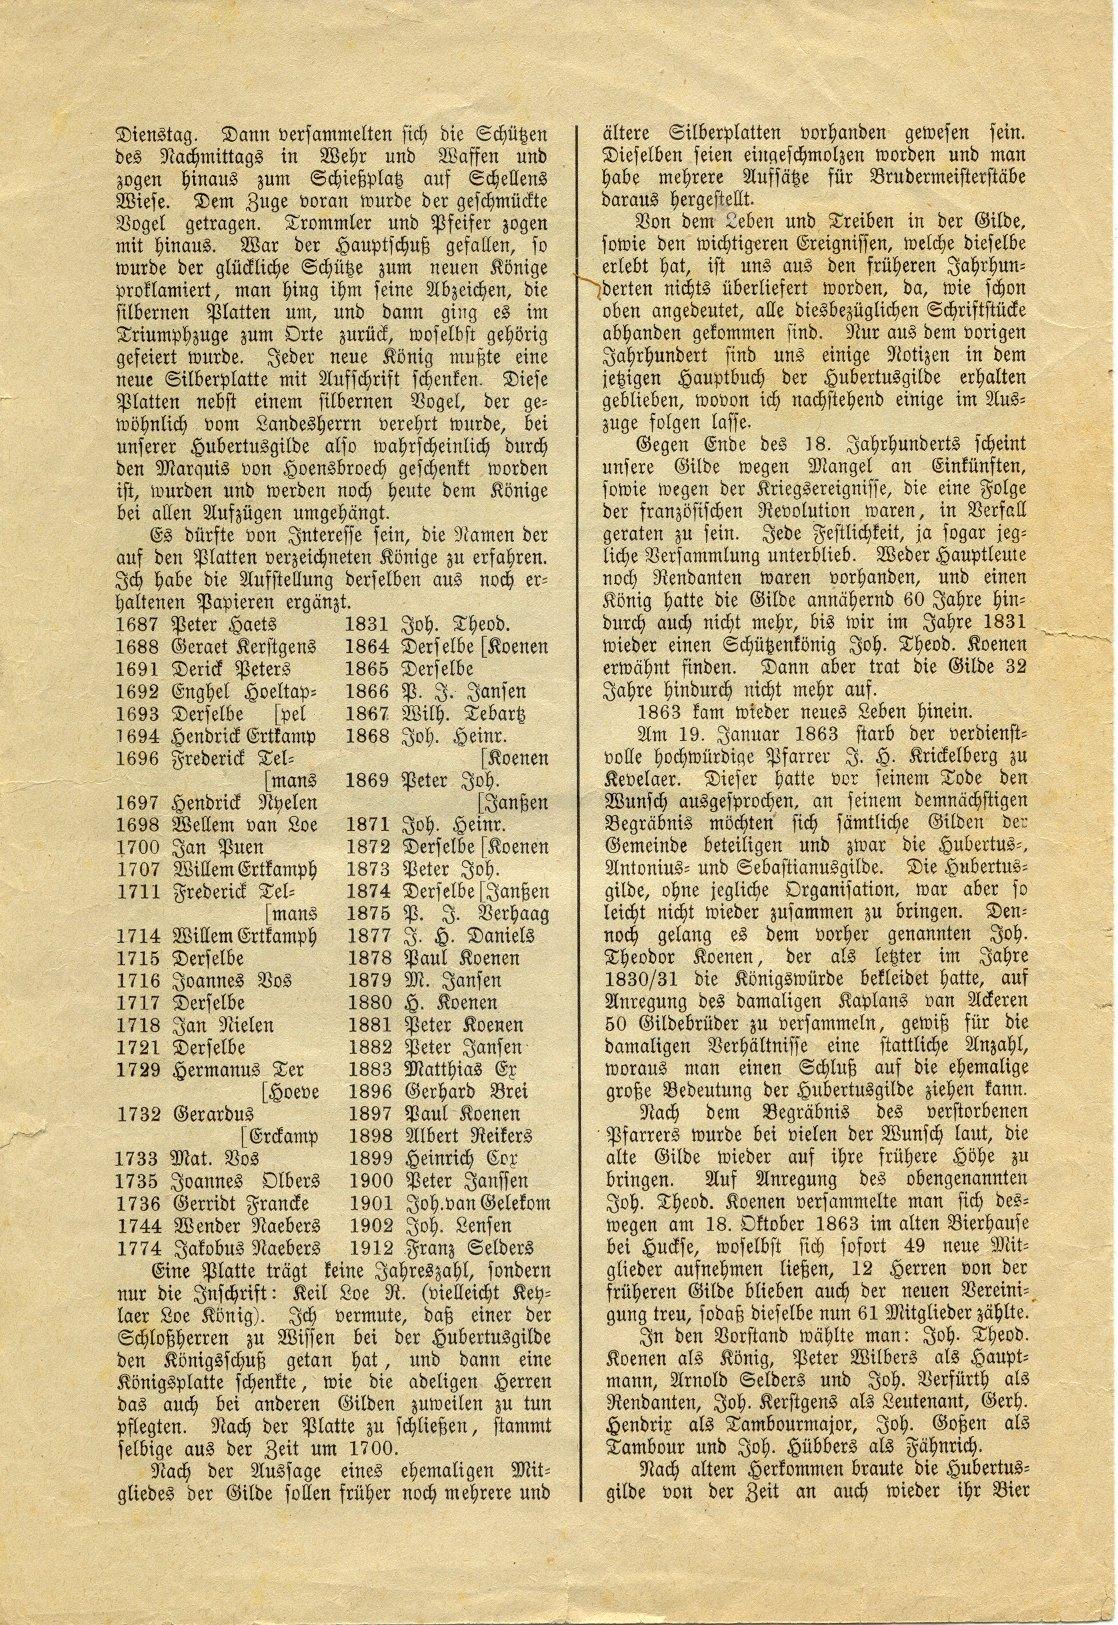 UH-1912-6-2